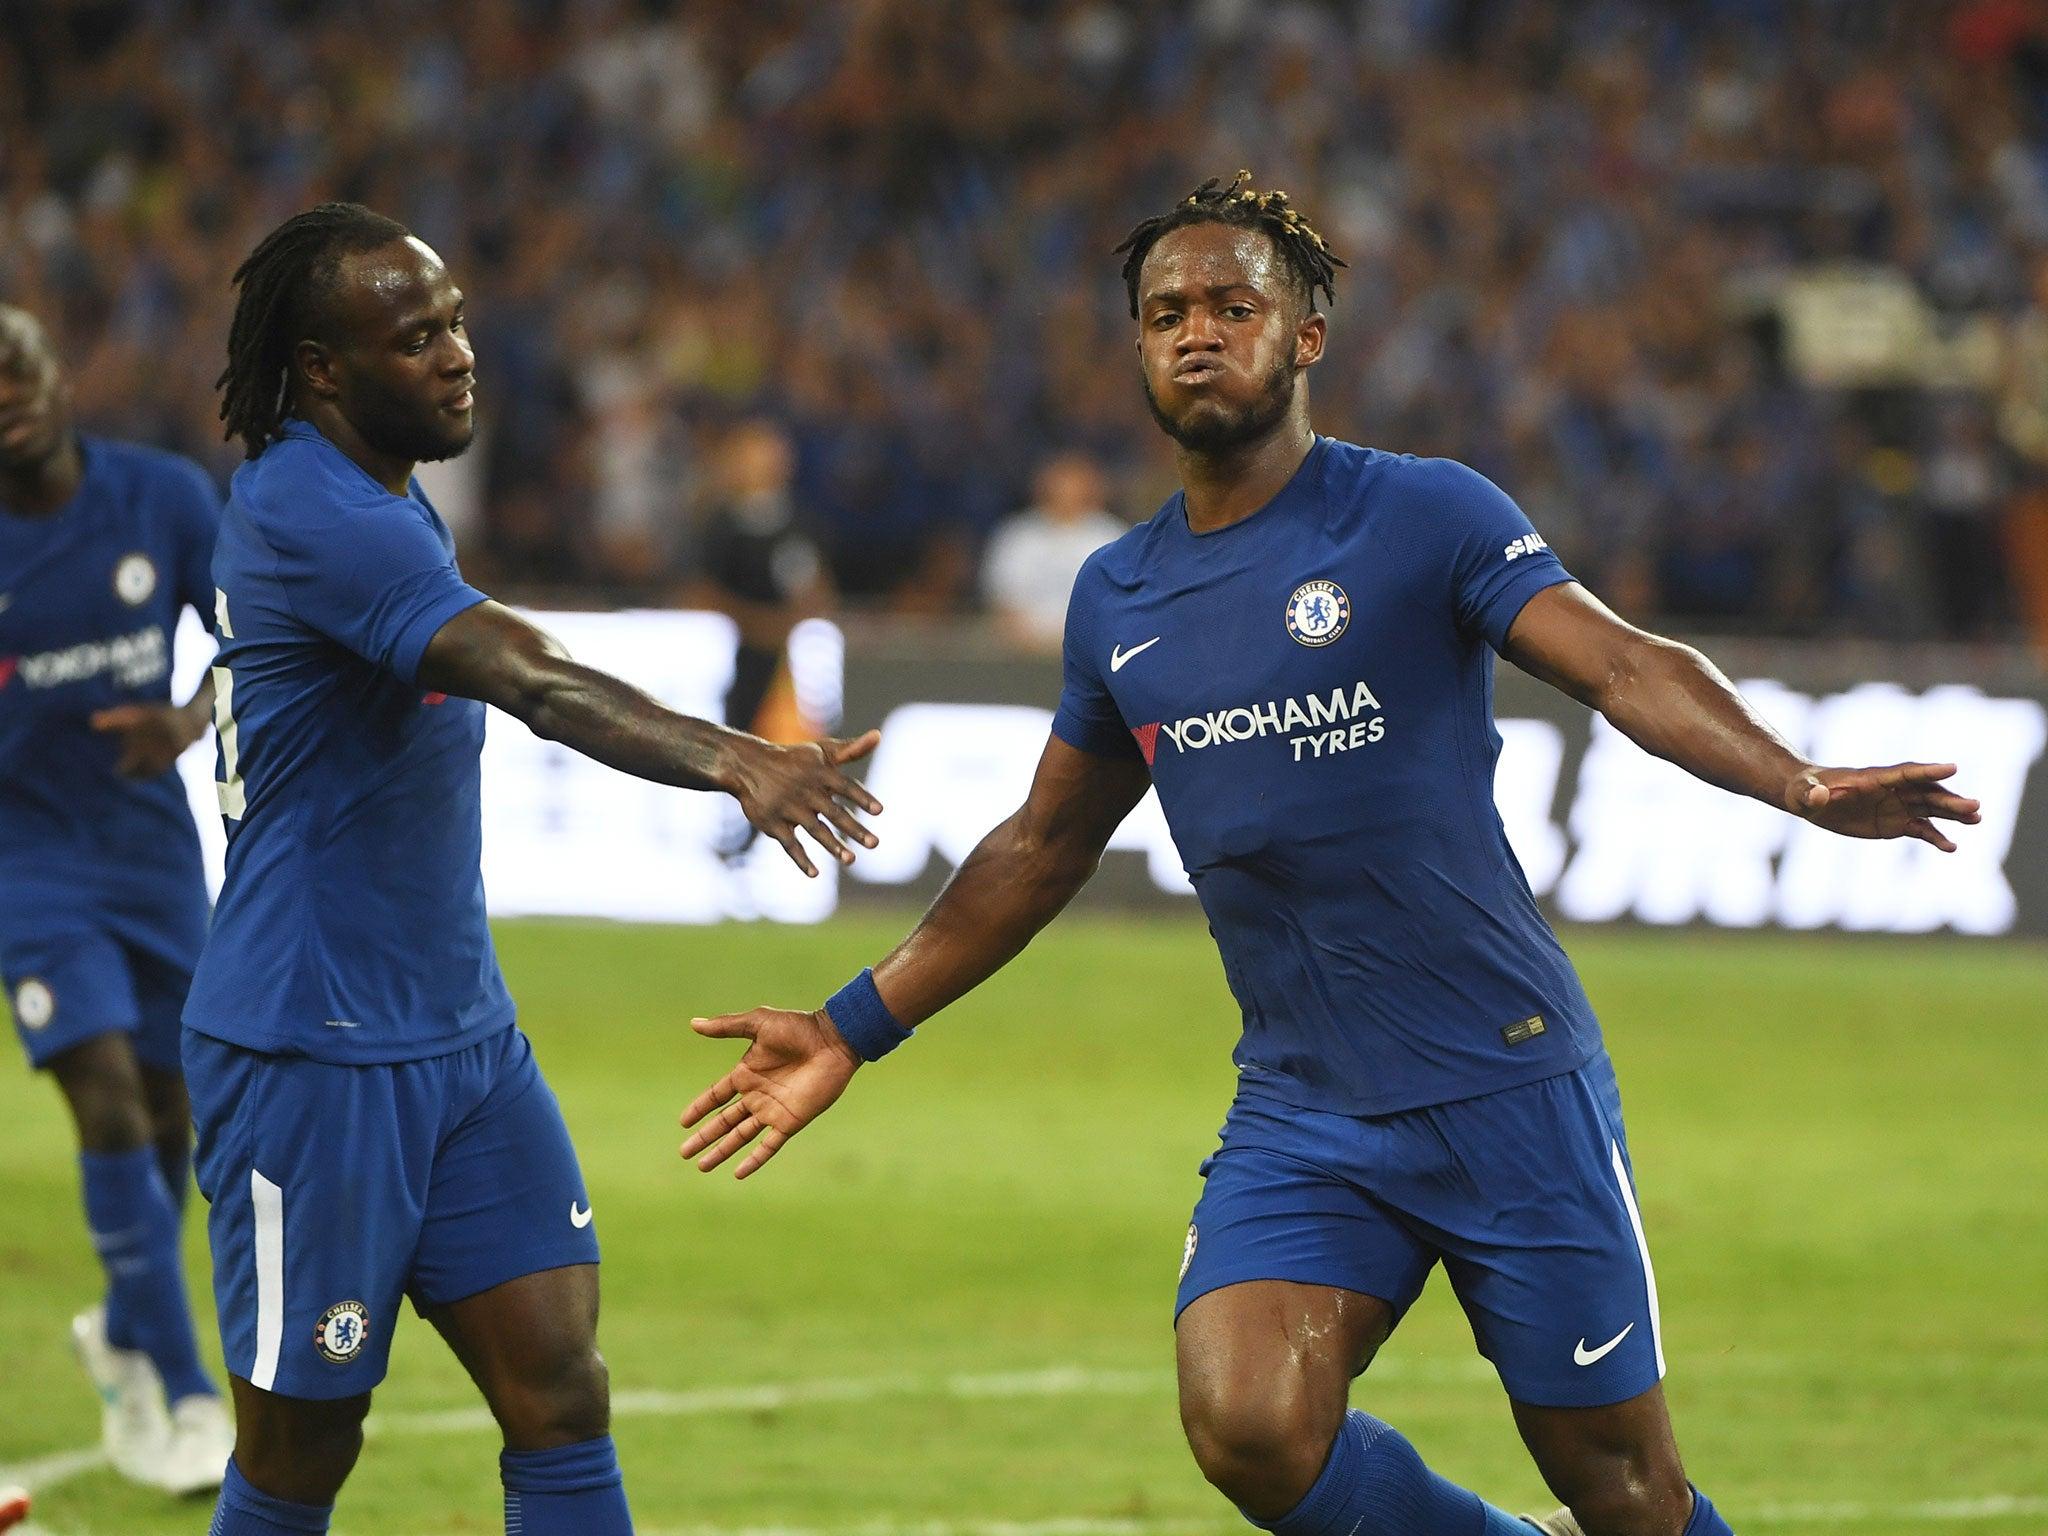 Chelsea's Michy Batshuayi denies laughing at Alvaro Morata penalty miss